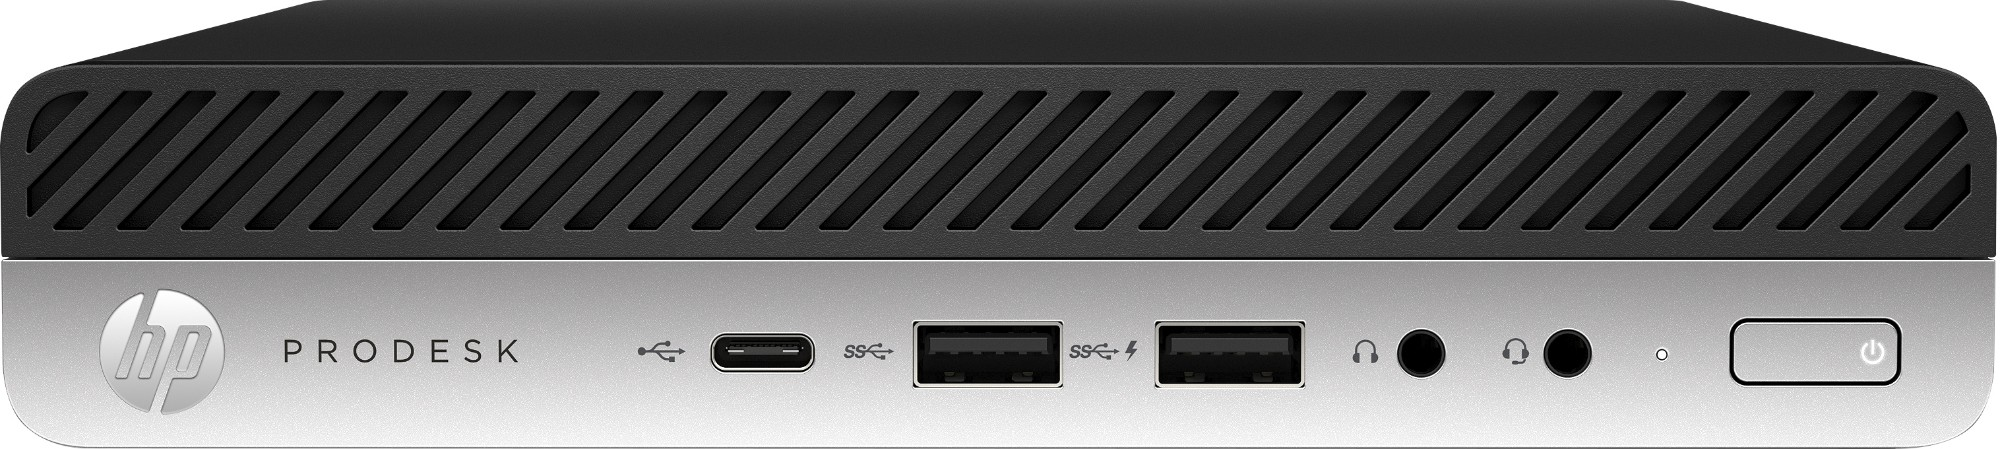 HP ProDesk 600 G5 9na generación de procesadores Intel® Core™ i5 i5-9500T 8 GB DDR4-SDRAM 256 GB SSD mini PC Negro Windows 10 Pro